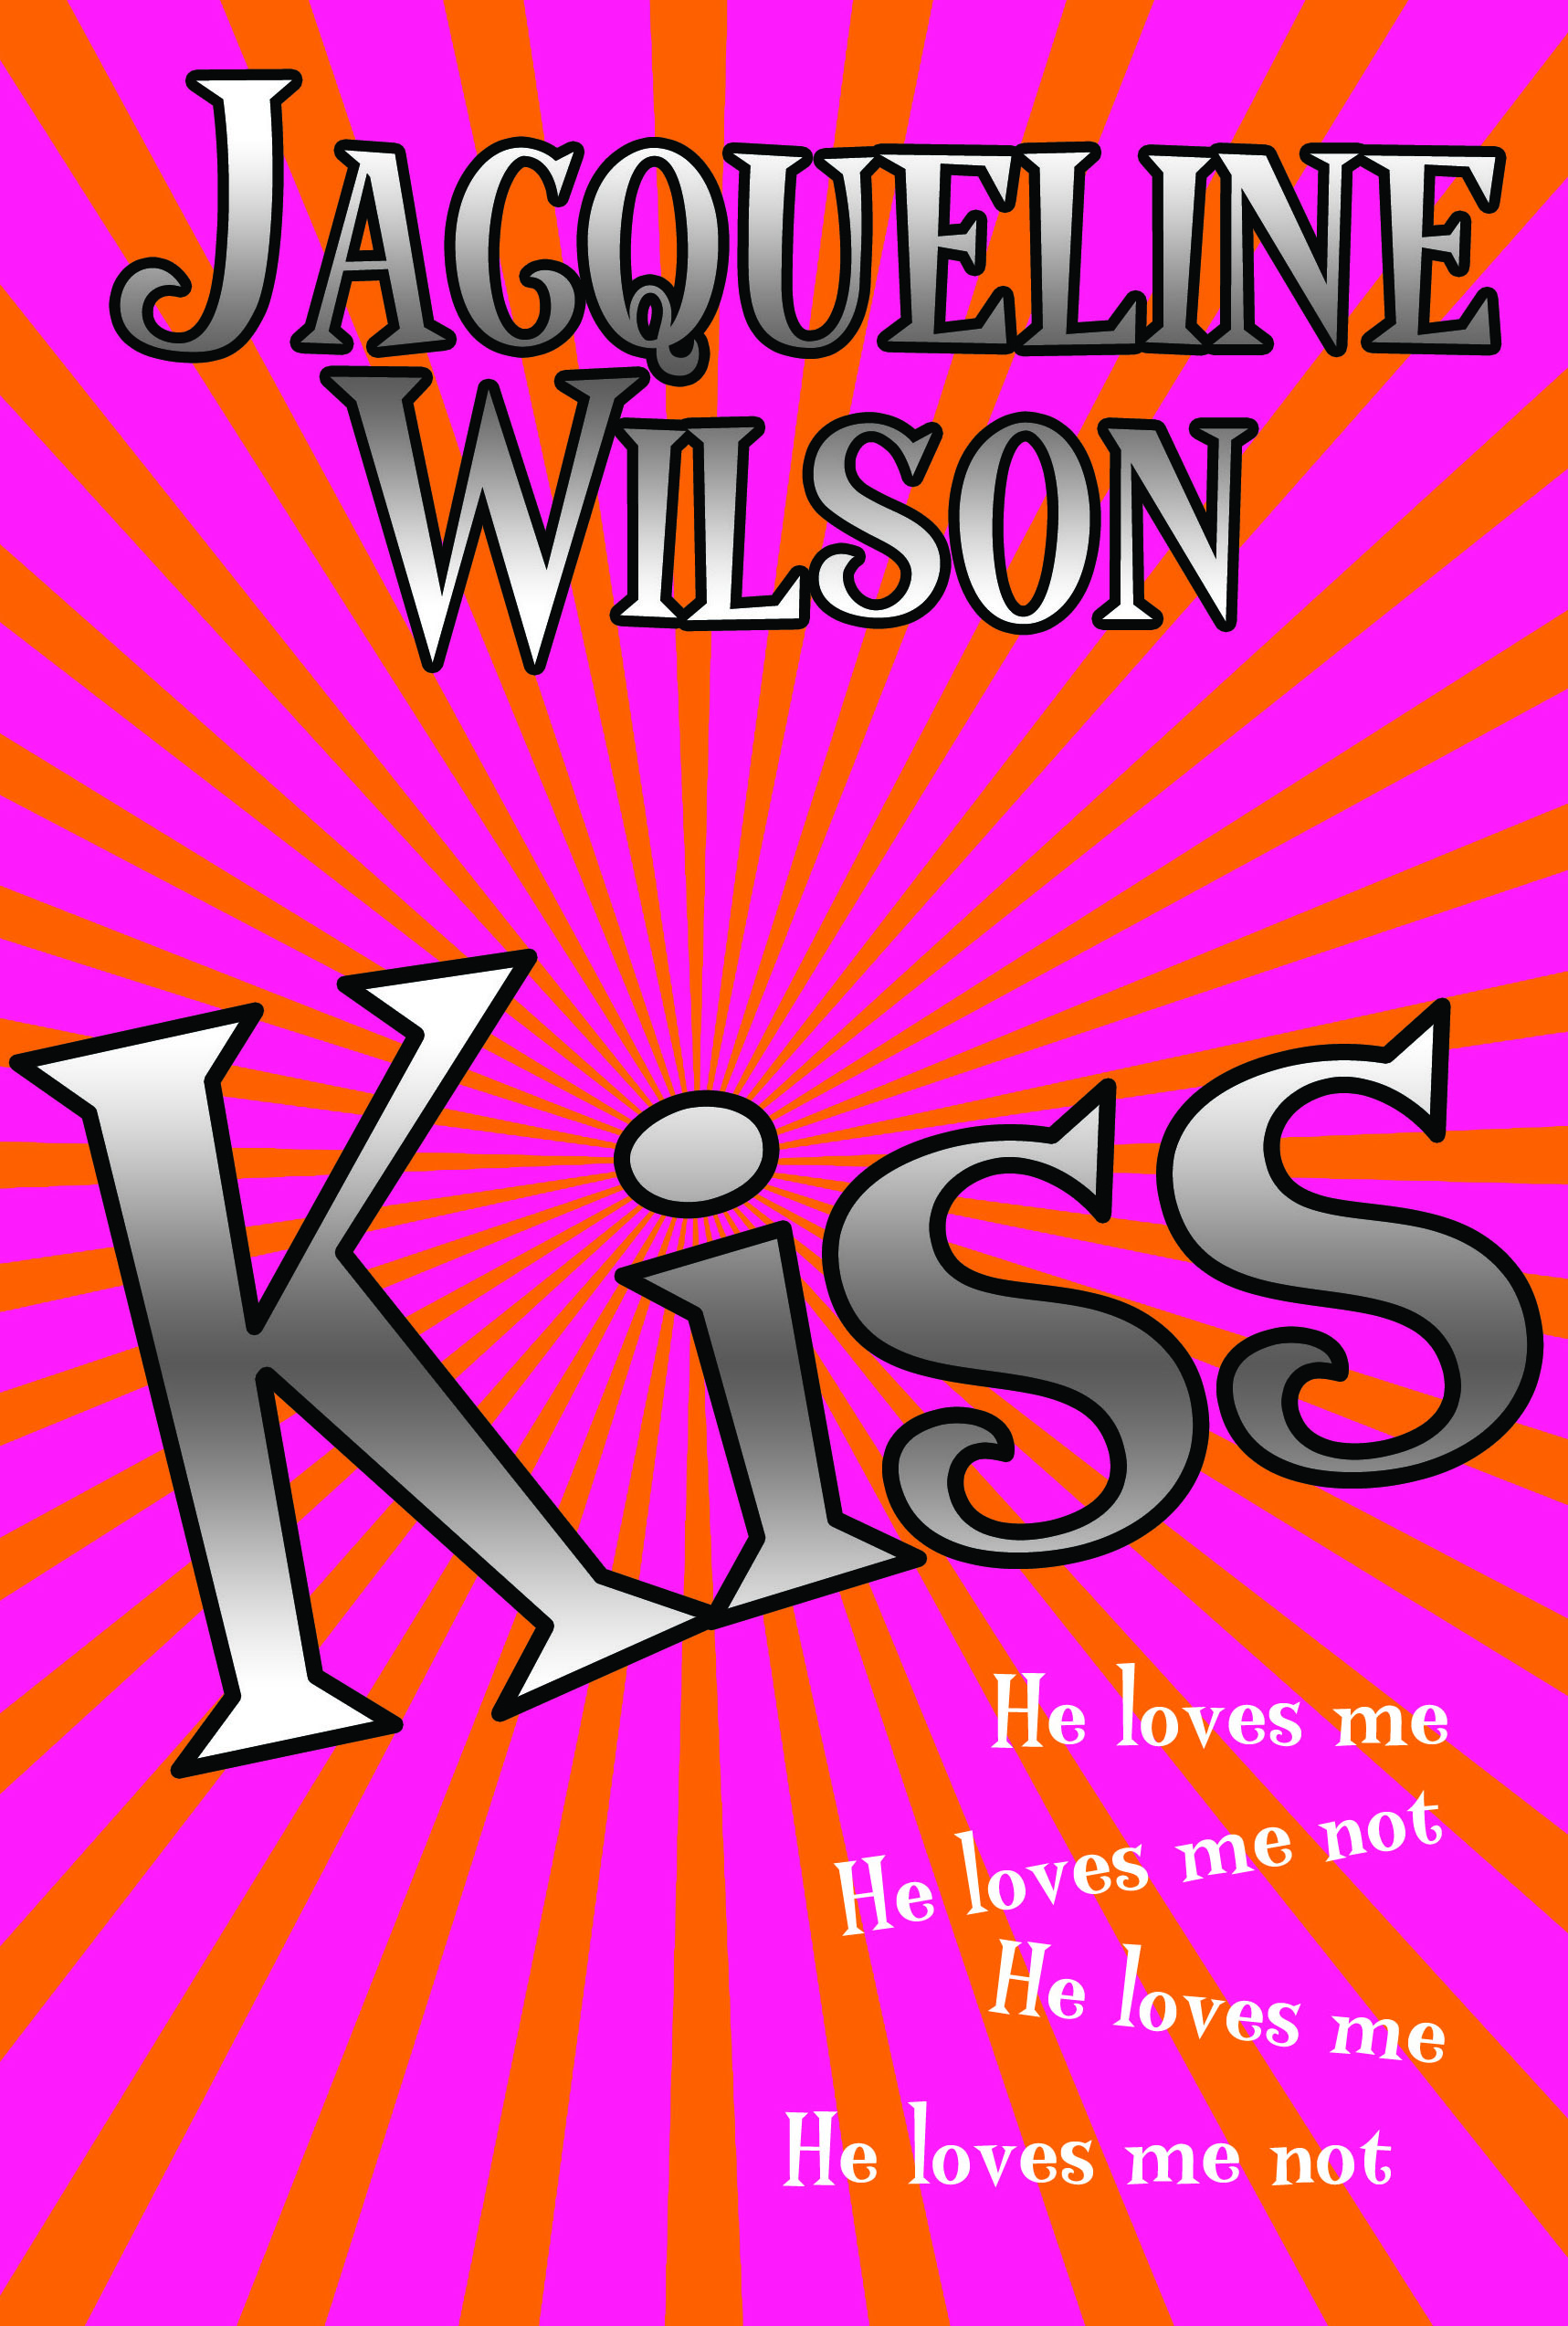 wilson-kiss.jpg